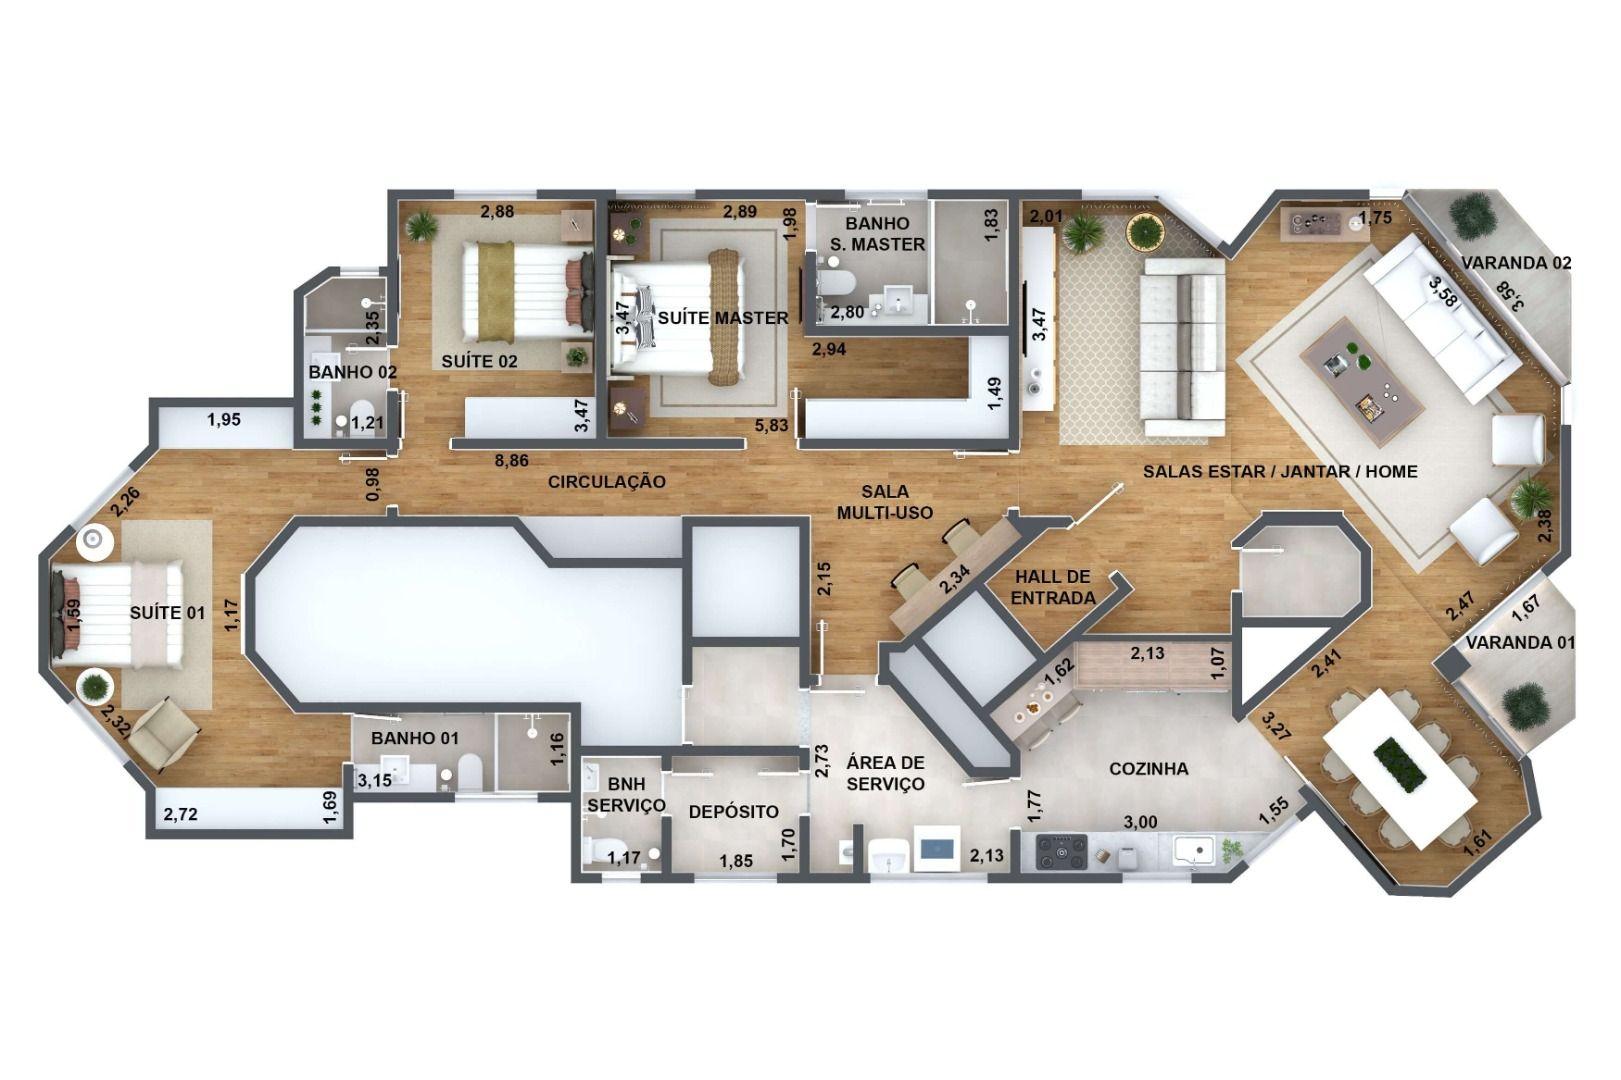 168 M² - 3 SUÍTES. (Apartamento 121, 12º andar).